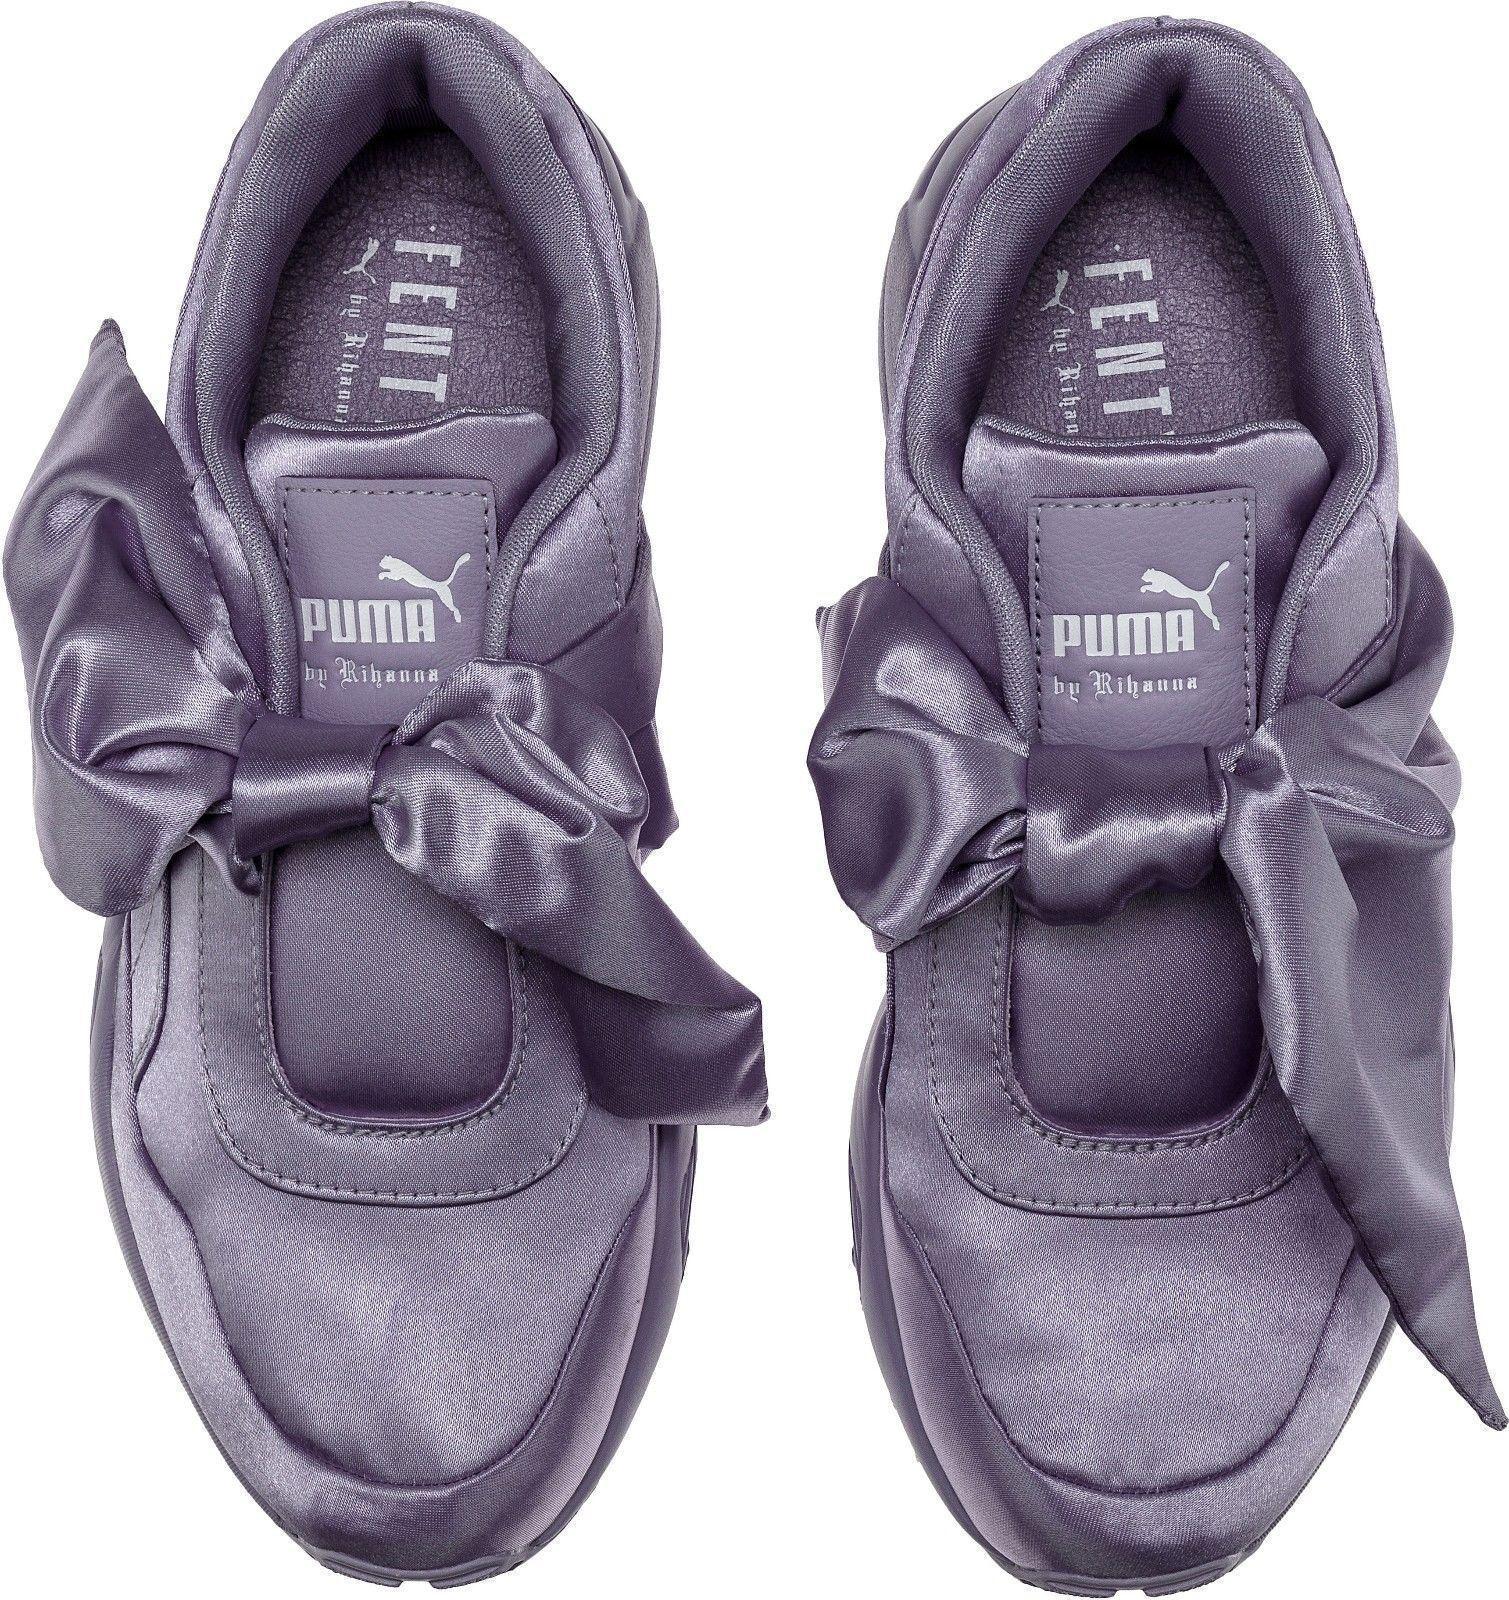 Wmns Puma X Fenty Rihanna Bow Sneaker Sweet Sweet Sweet Lavender Satin 365054-03 18671d